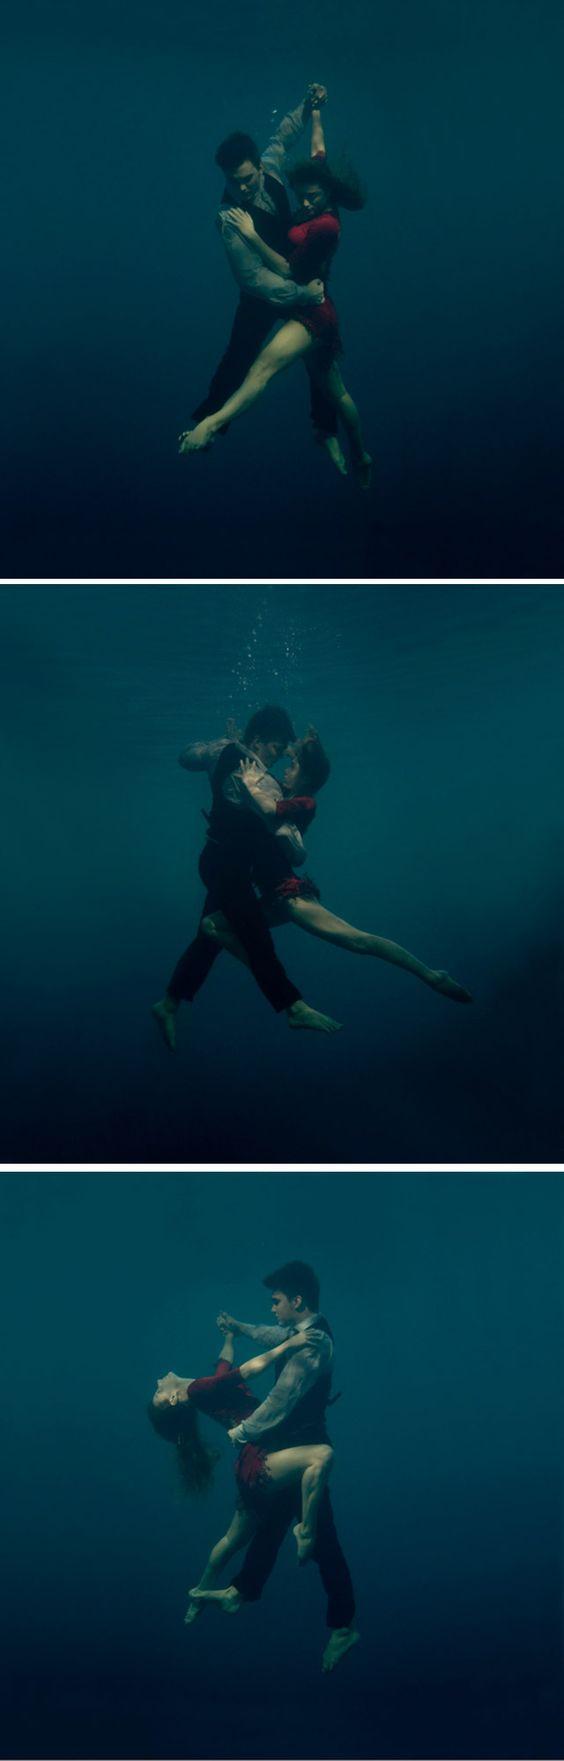 Tango under water